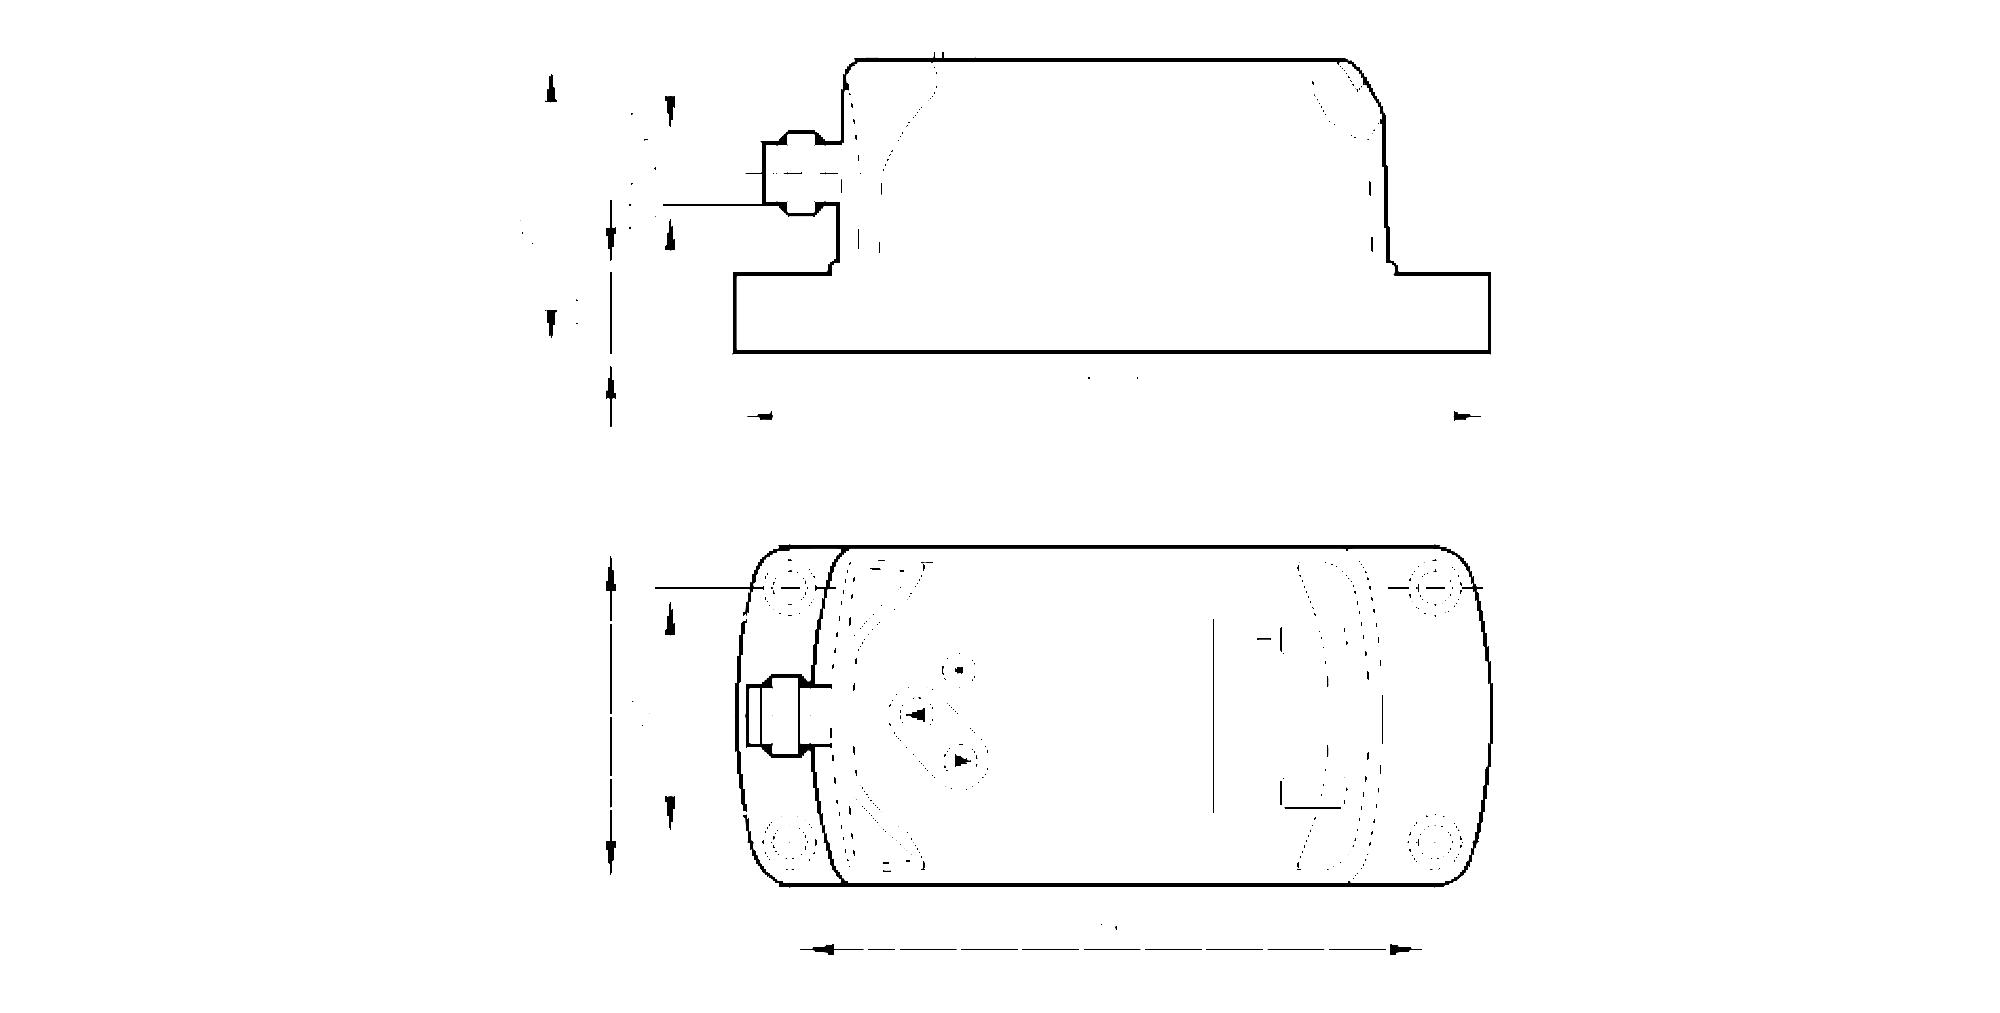 e30443 - io-link display